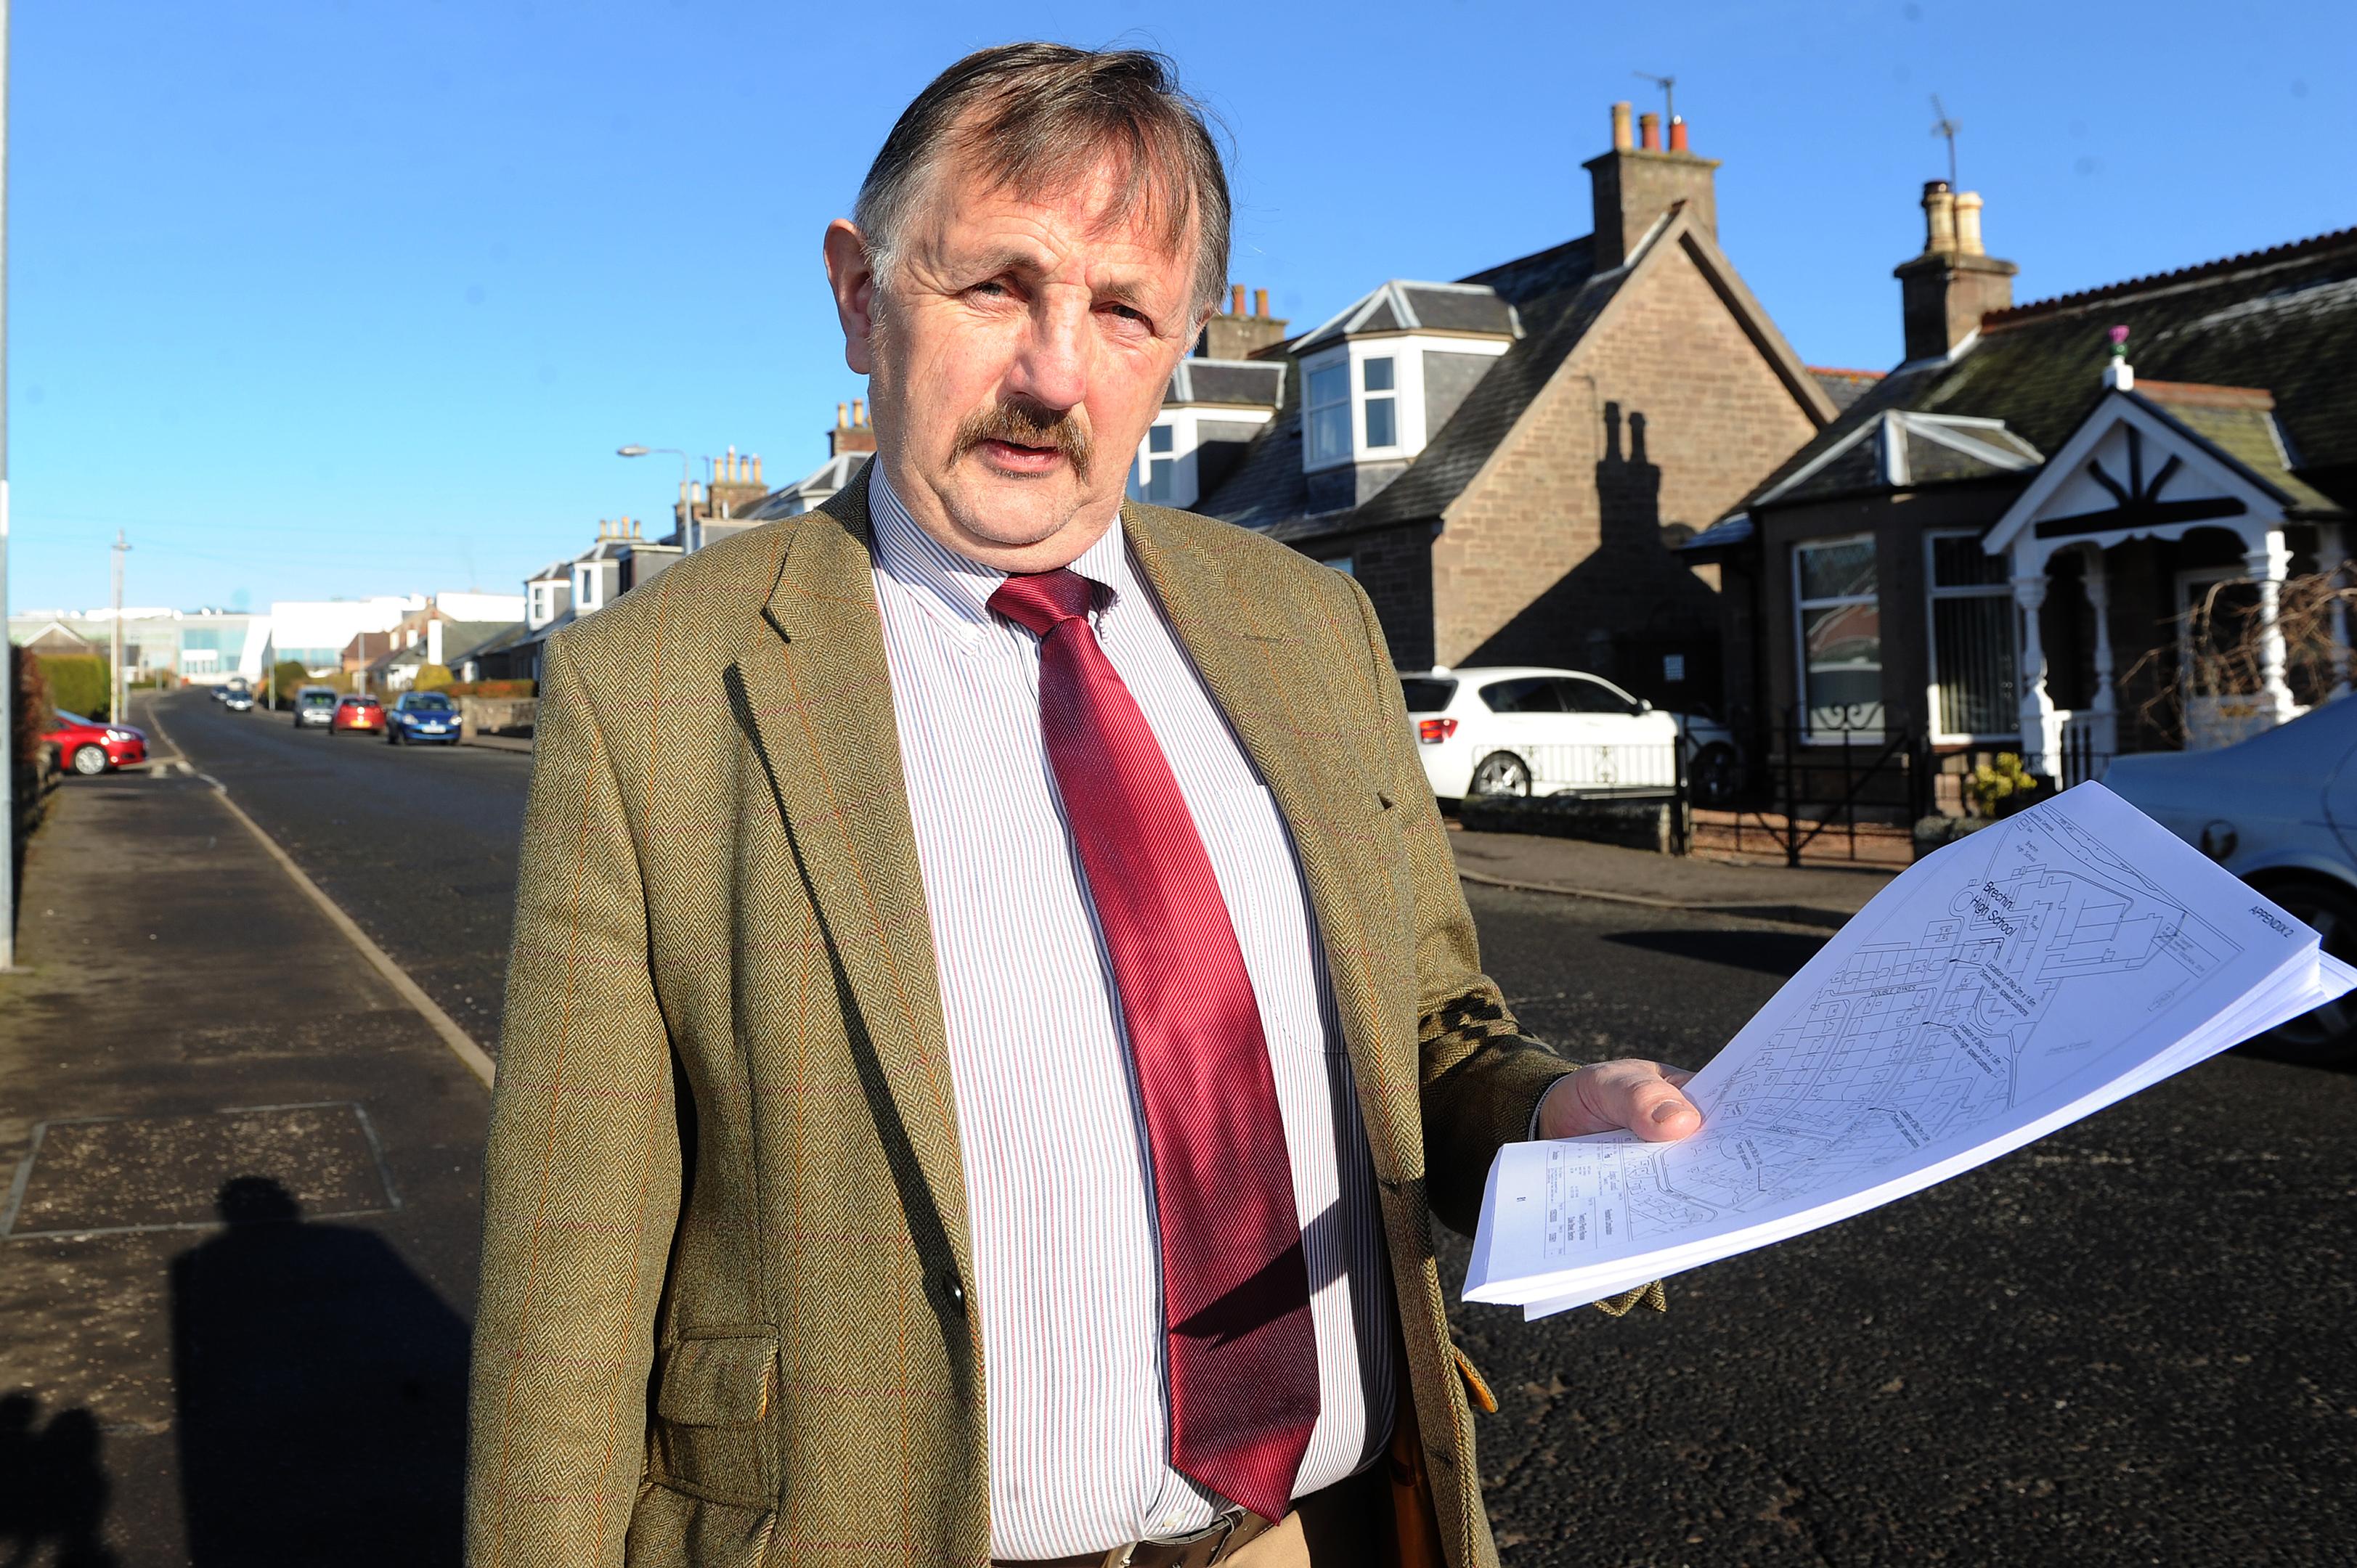 Councillor Bob Myles supported the application.